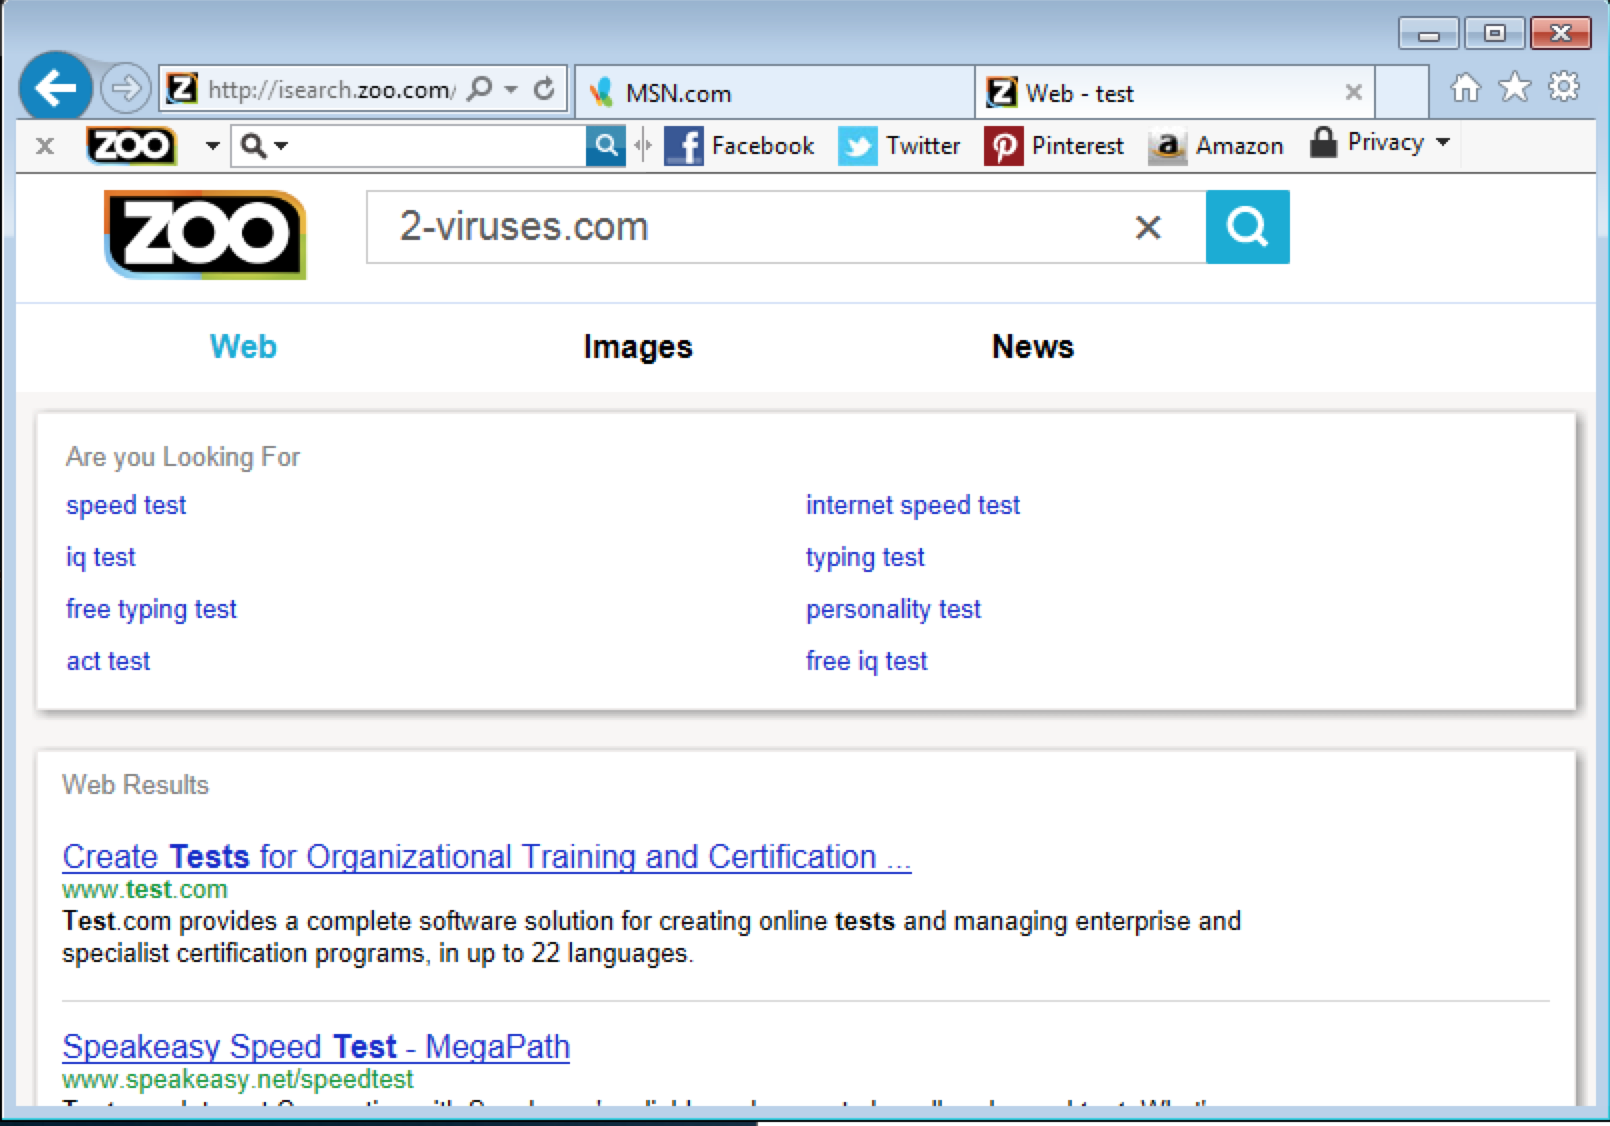 Isearch.zoo.com Virus